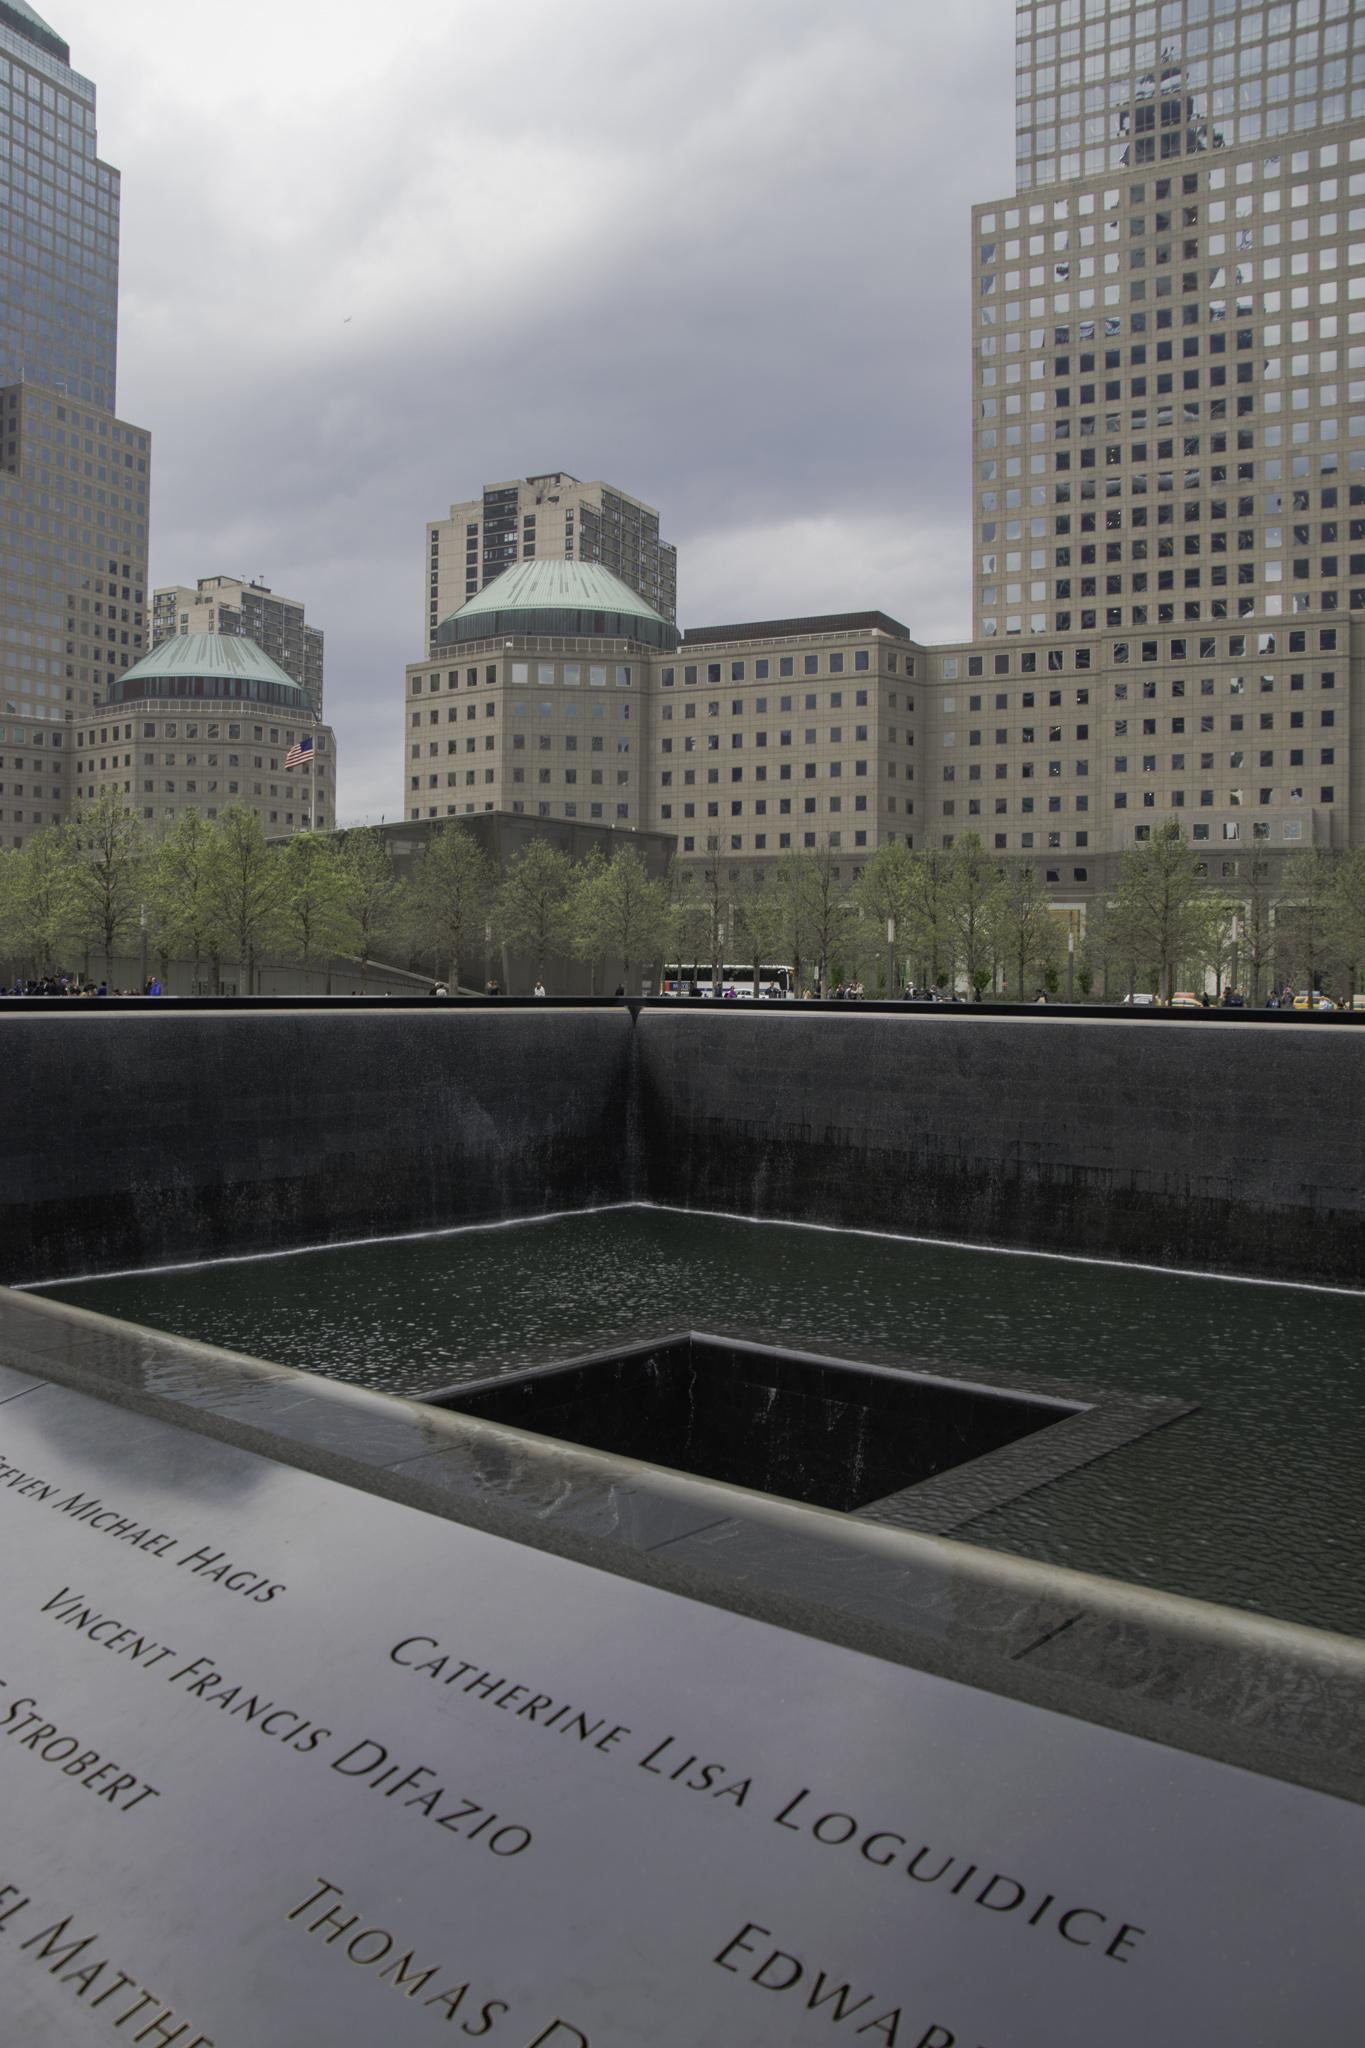 9/11-Memorial am Ground Zero